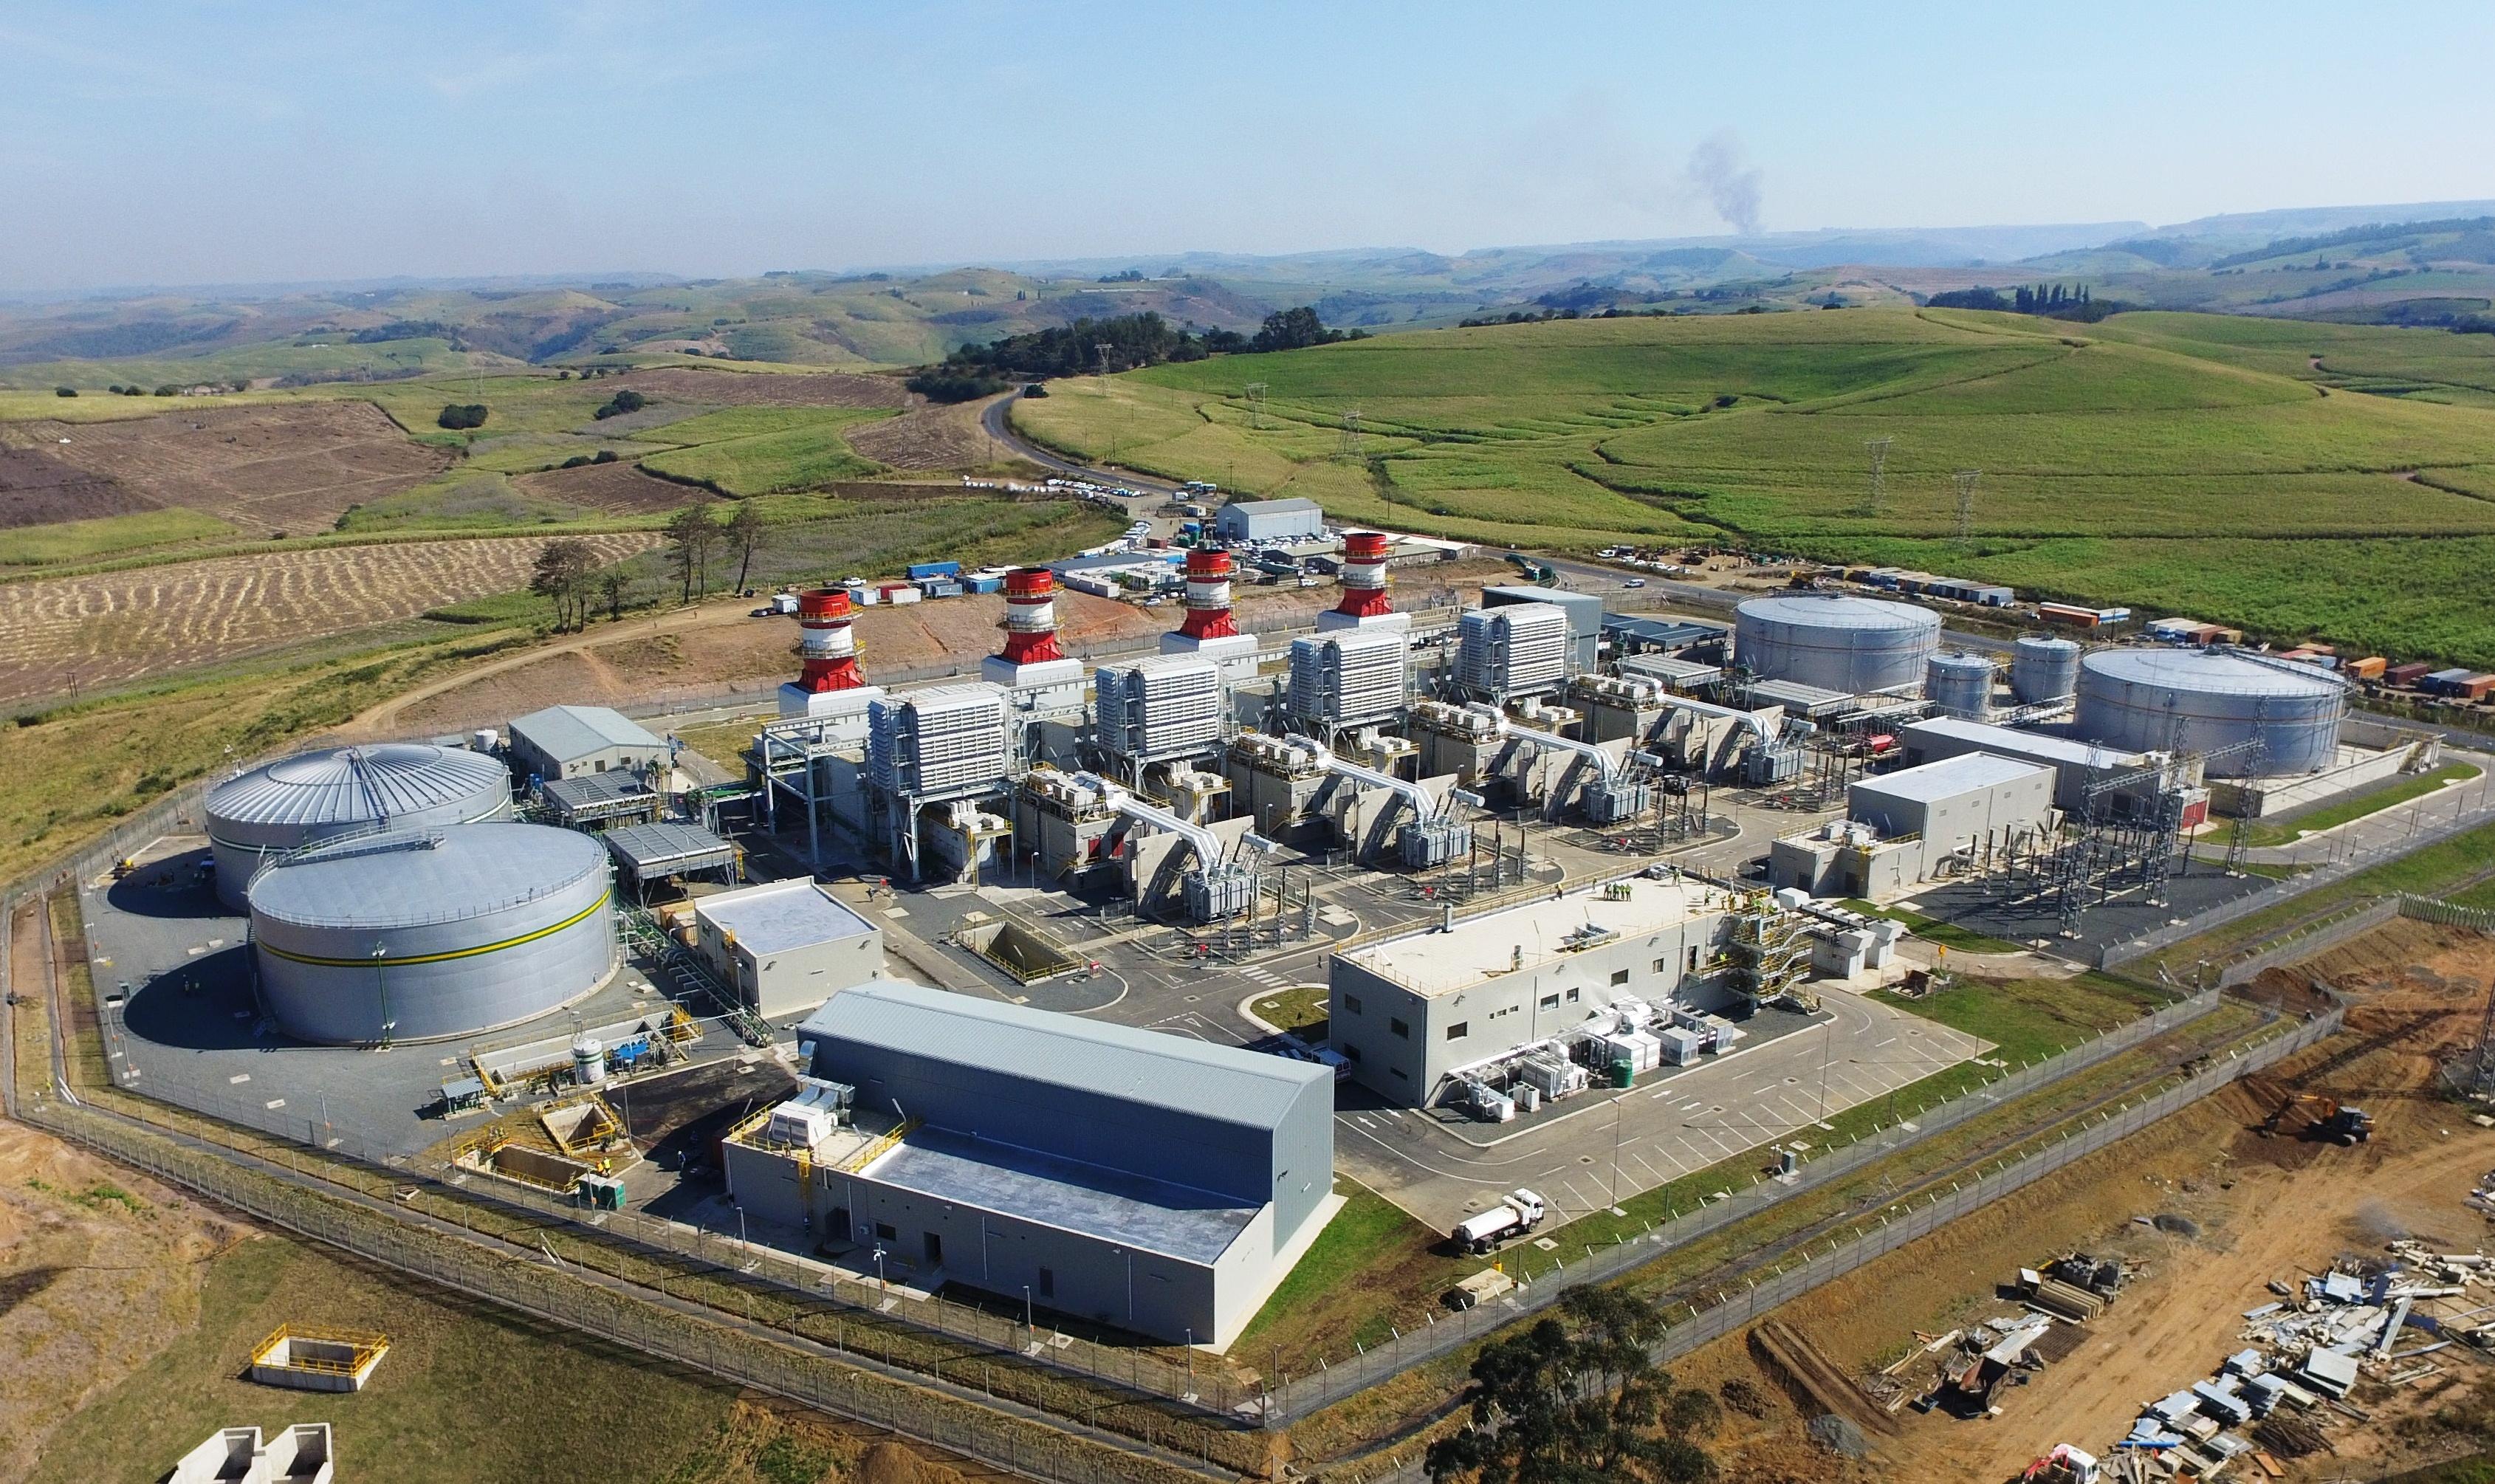 ansaldo-impianto-avon-sudafrica.jpg